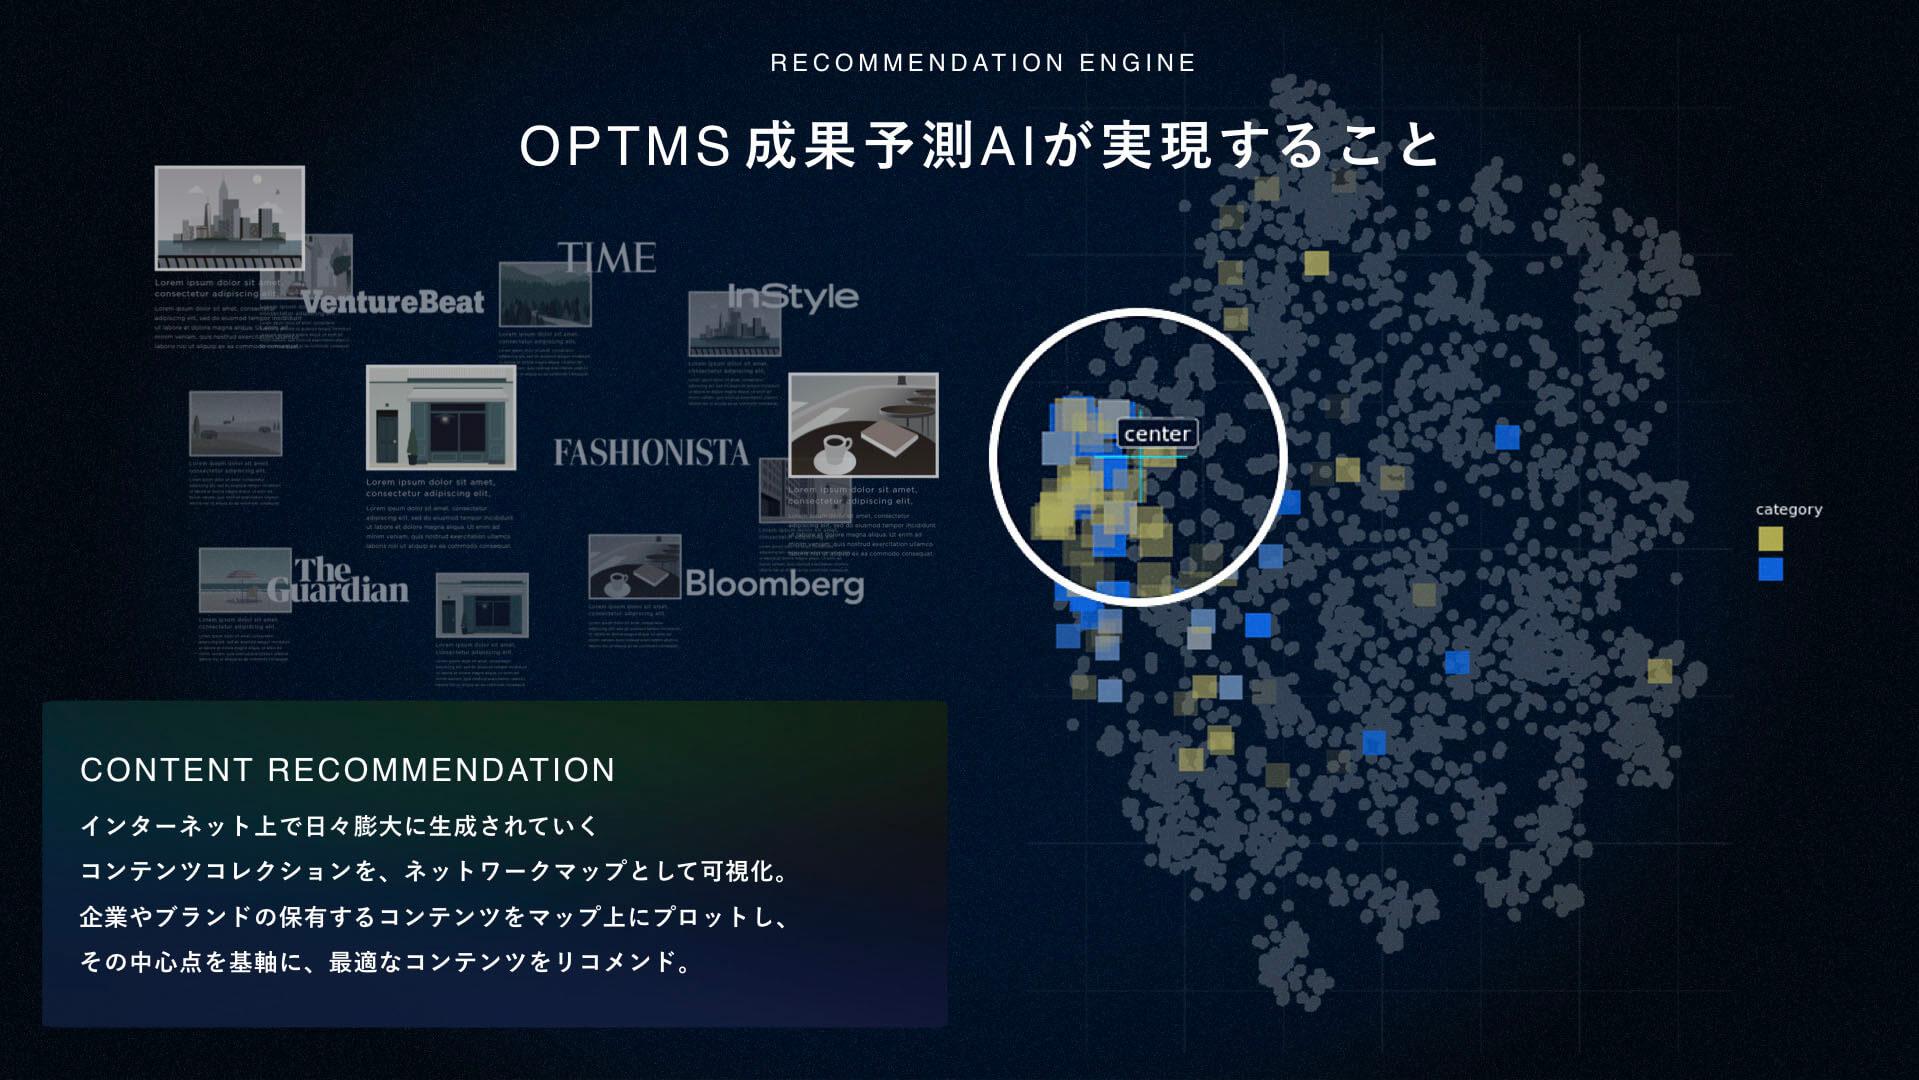 OPTMS成果予測AIが実現すること。CONTENT RECOMMENDATION。インターネット上で日々膨大に生成されていくコンテンツコレクションを、ネットワークマップとして可視化。企業やブランドの保有するコンテンツをマップ上にプロットし、その中心点を基軸に、最適なコンテンツをリコメンド。